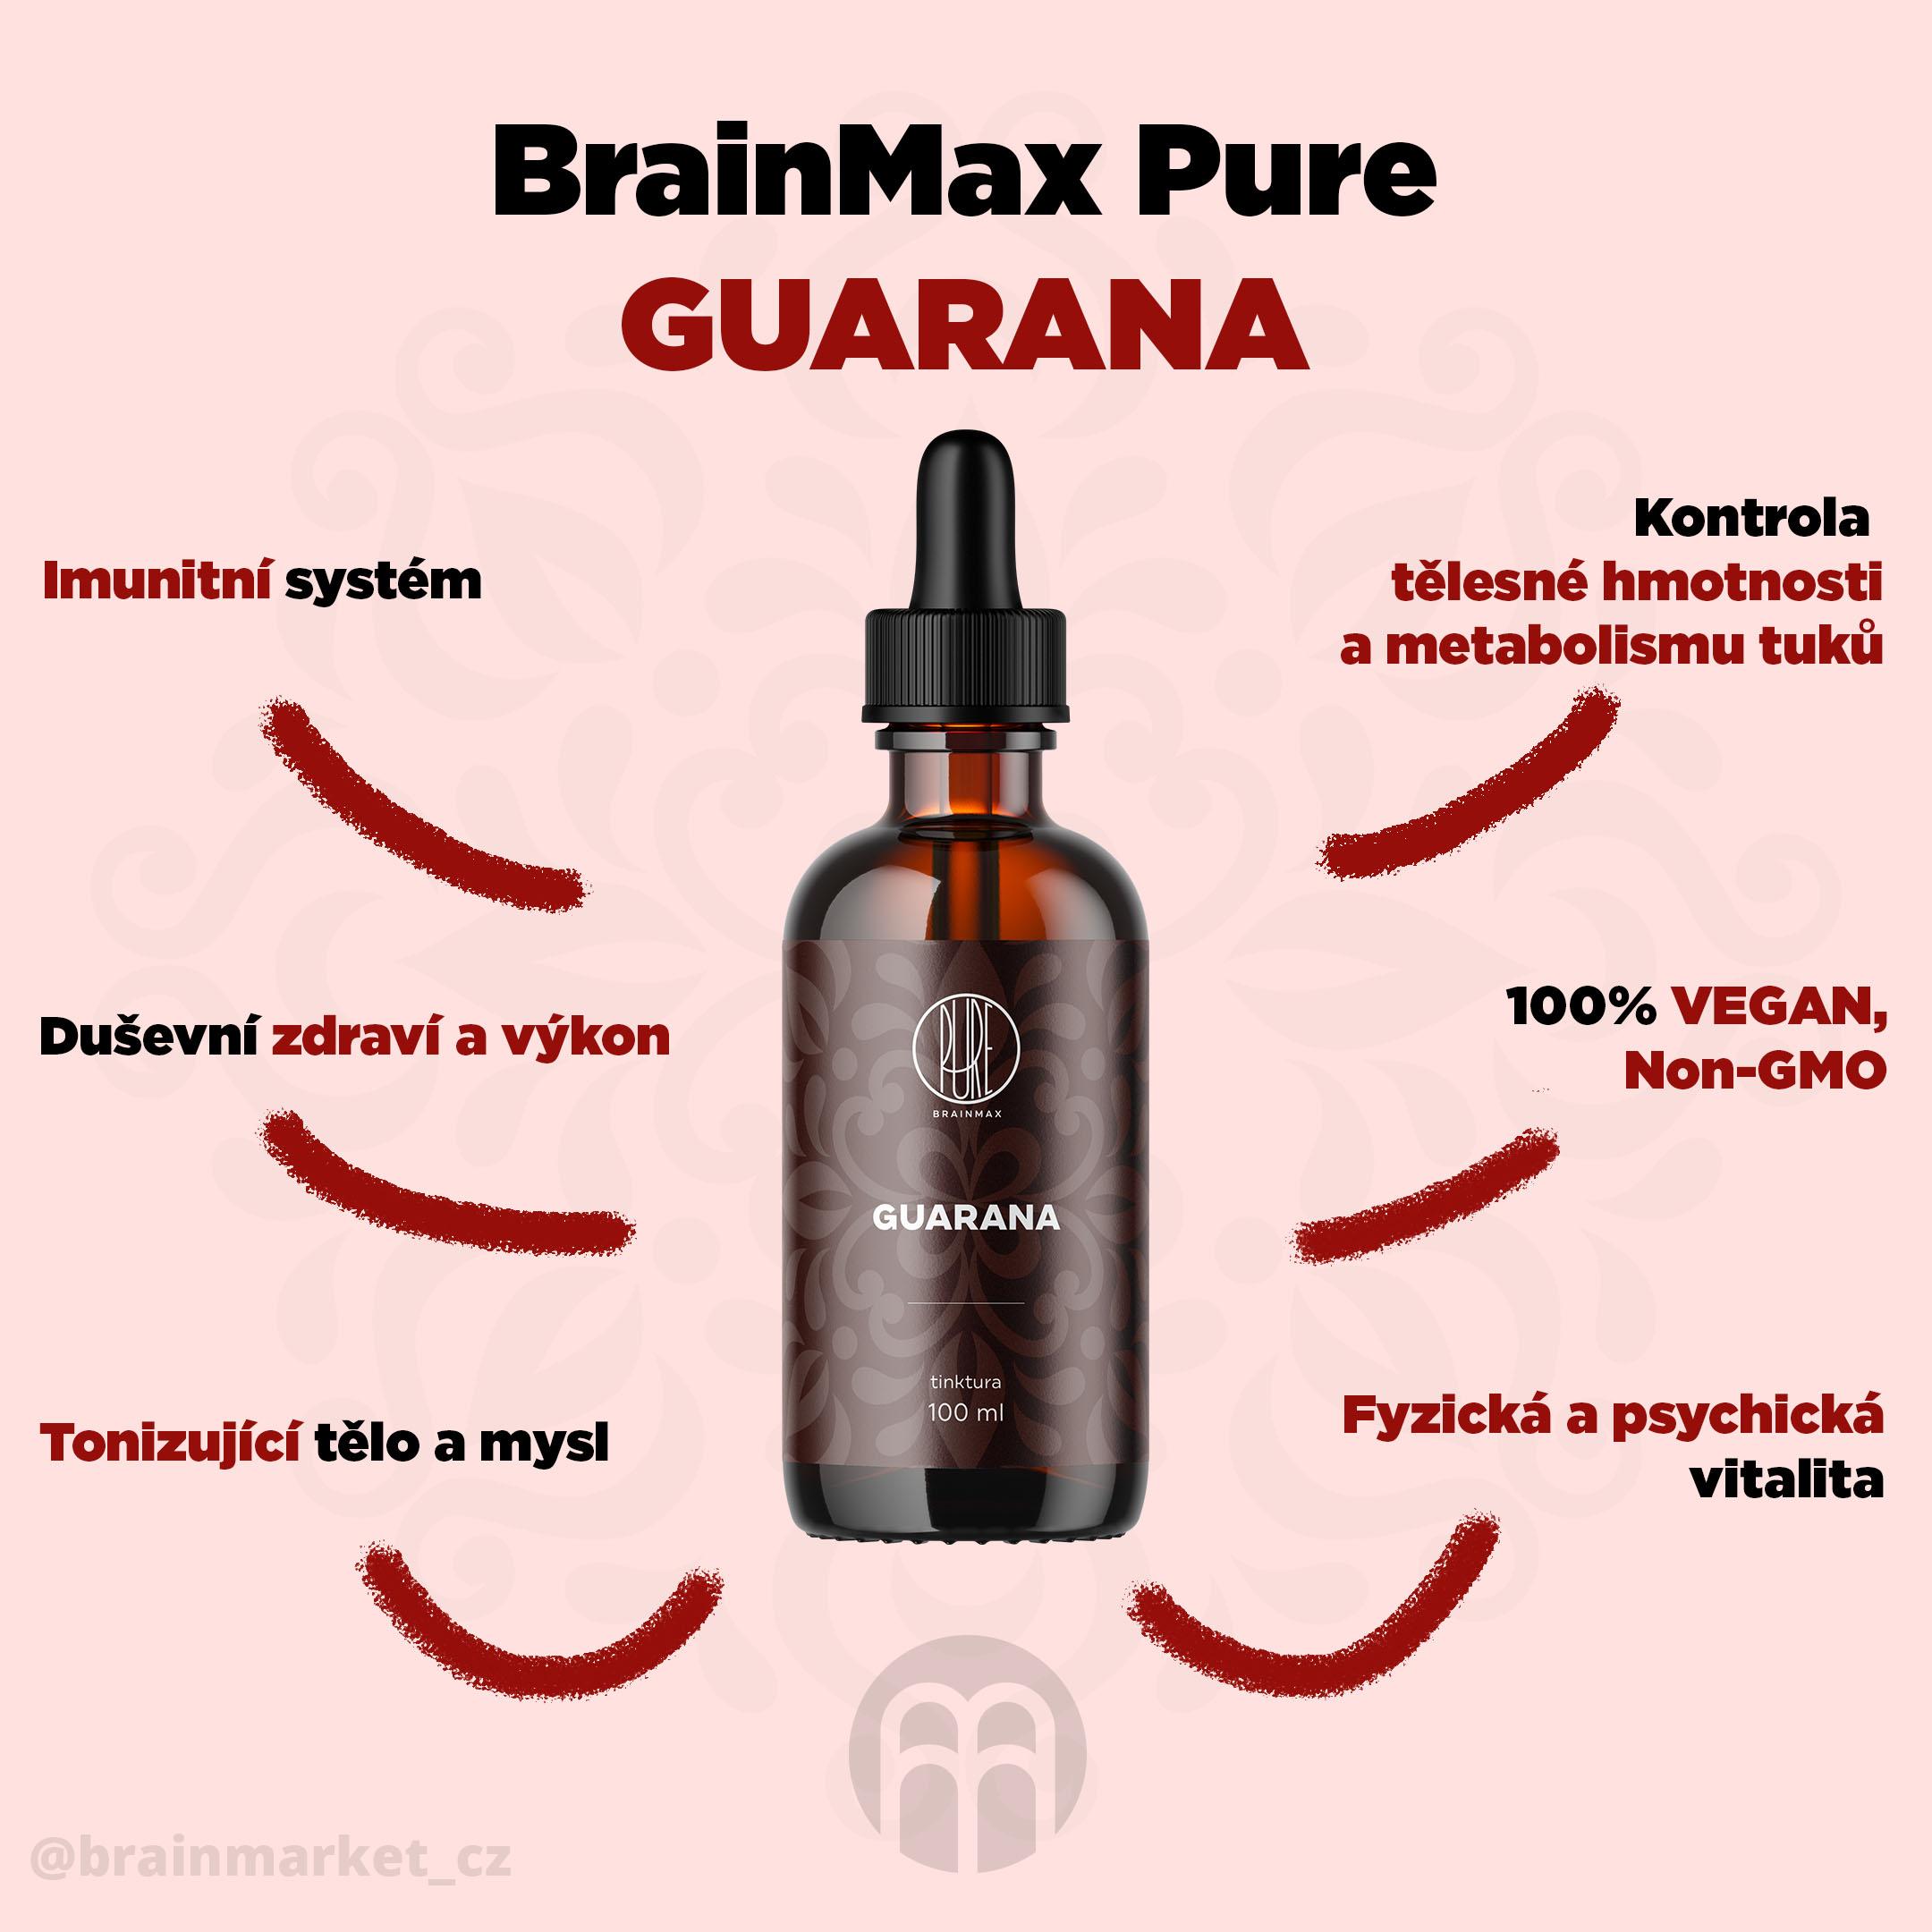 guarana_infografika_brainmarket_cz